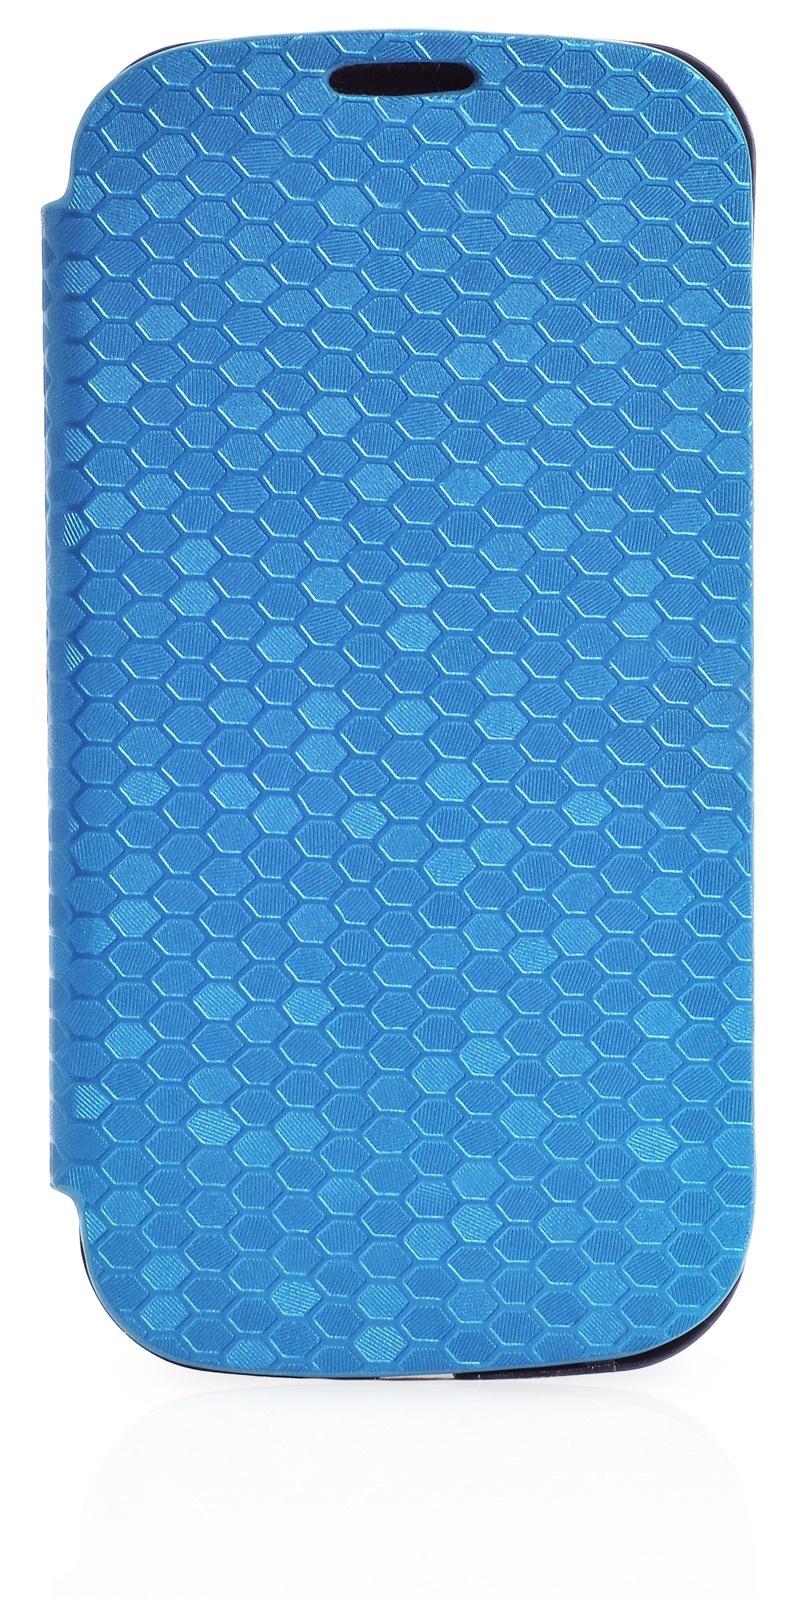 Чехол Gurdini Flip Case соты 380033 для Samsung Galaxy S3,380033, синий